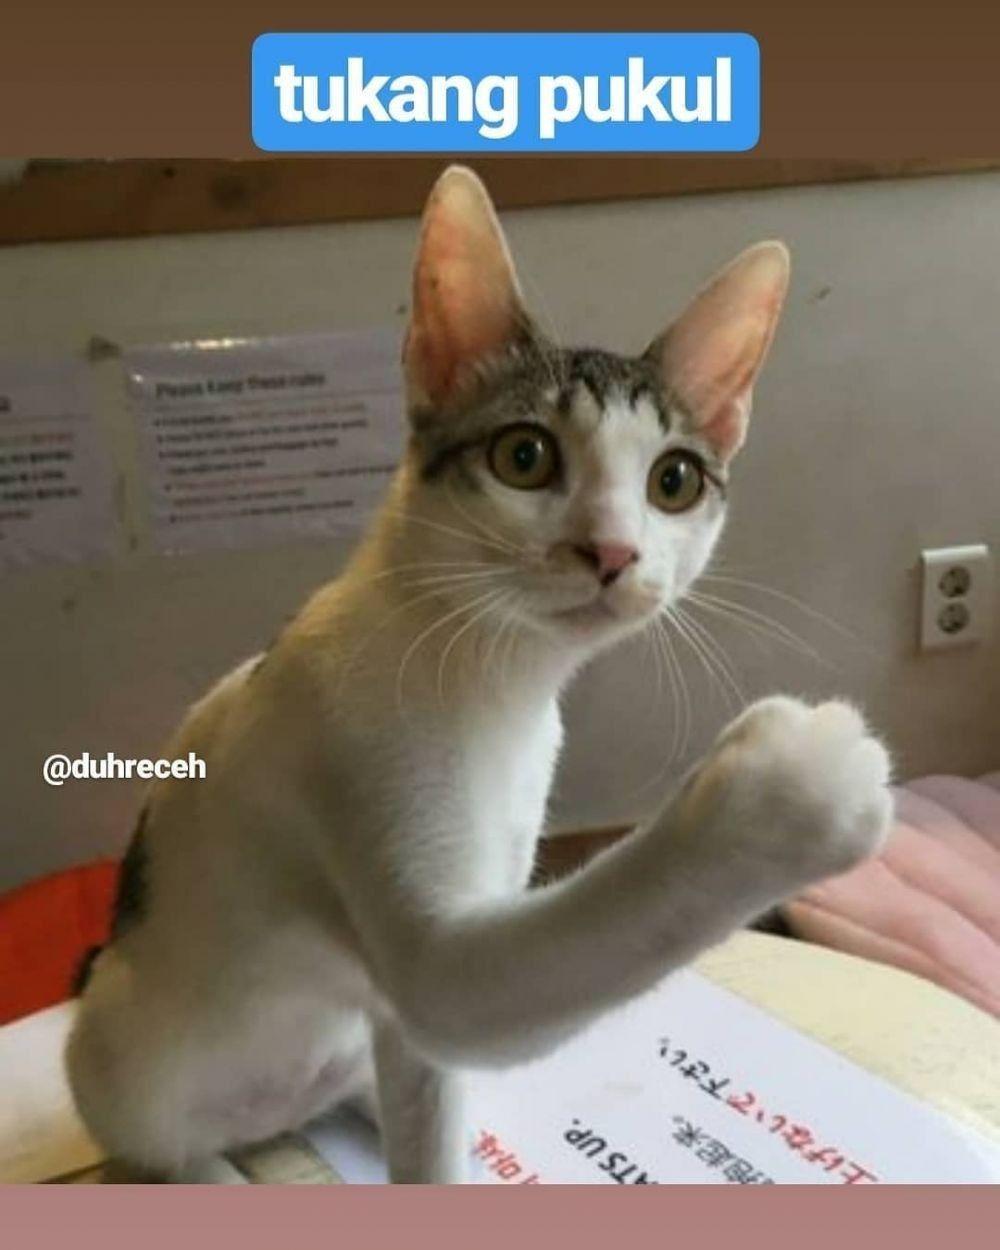 10 Meme Kocak Macam-Macam Pekerjaan Kucing Ini Bikin Gemas